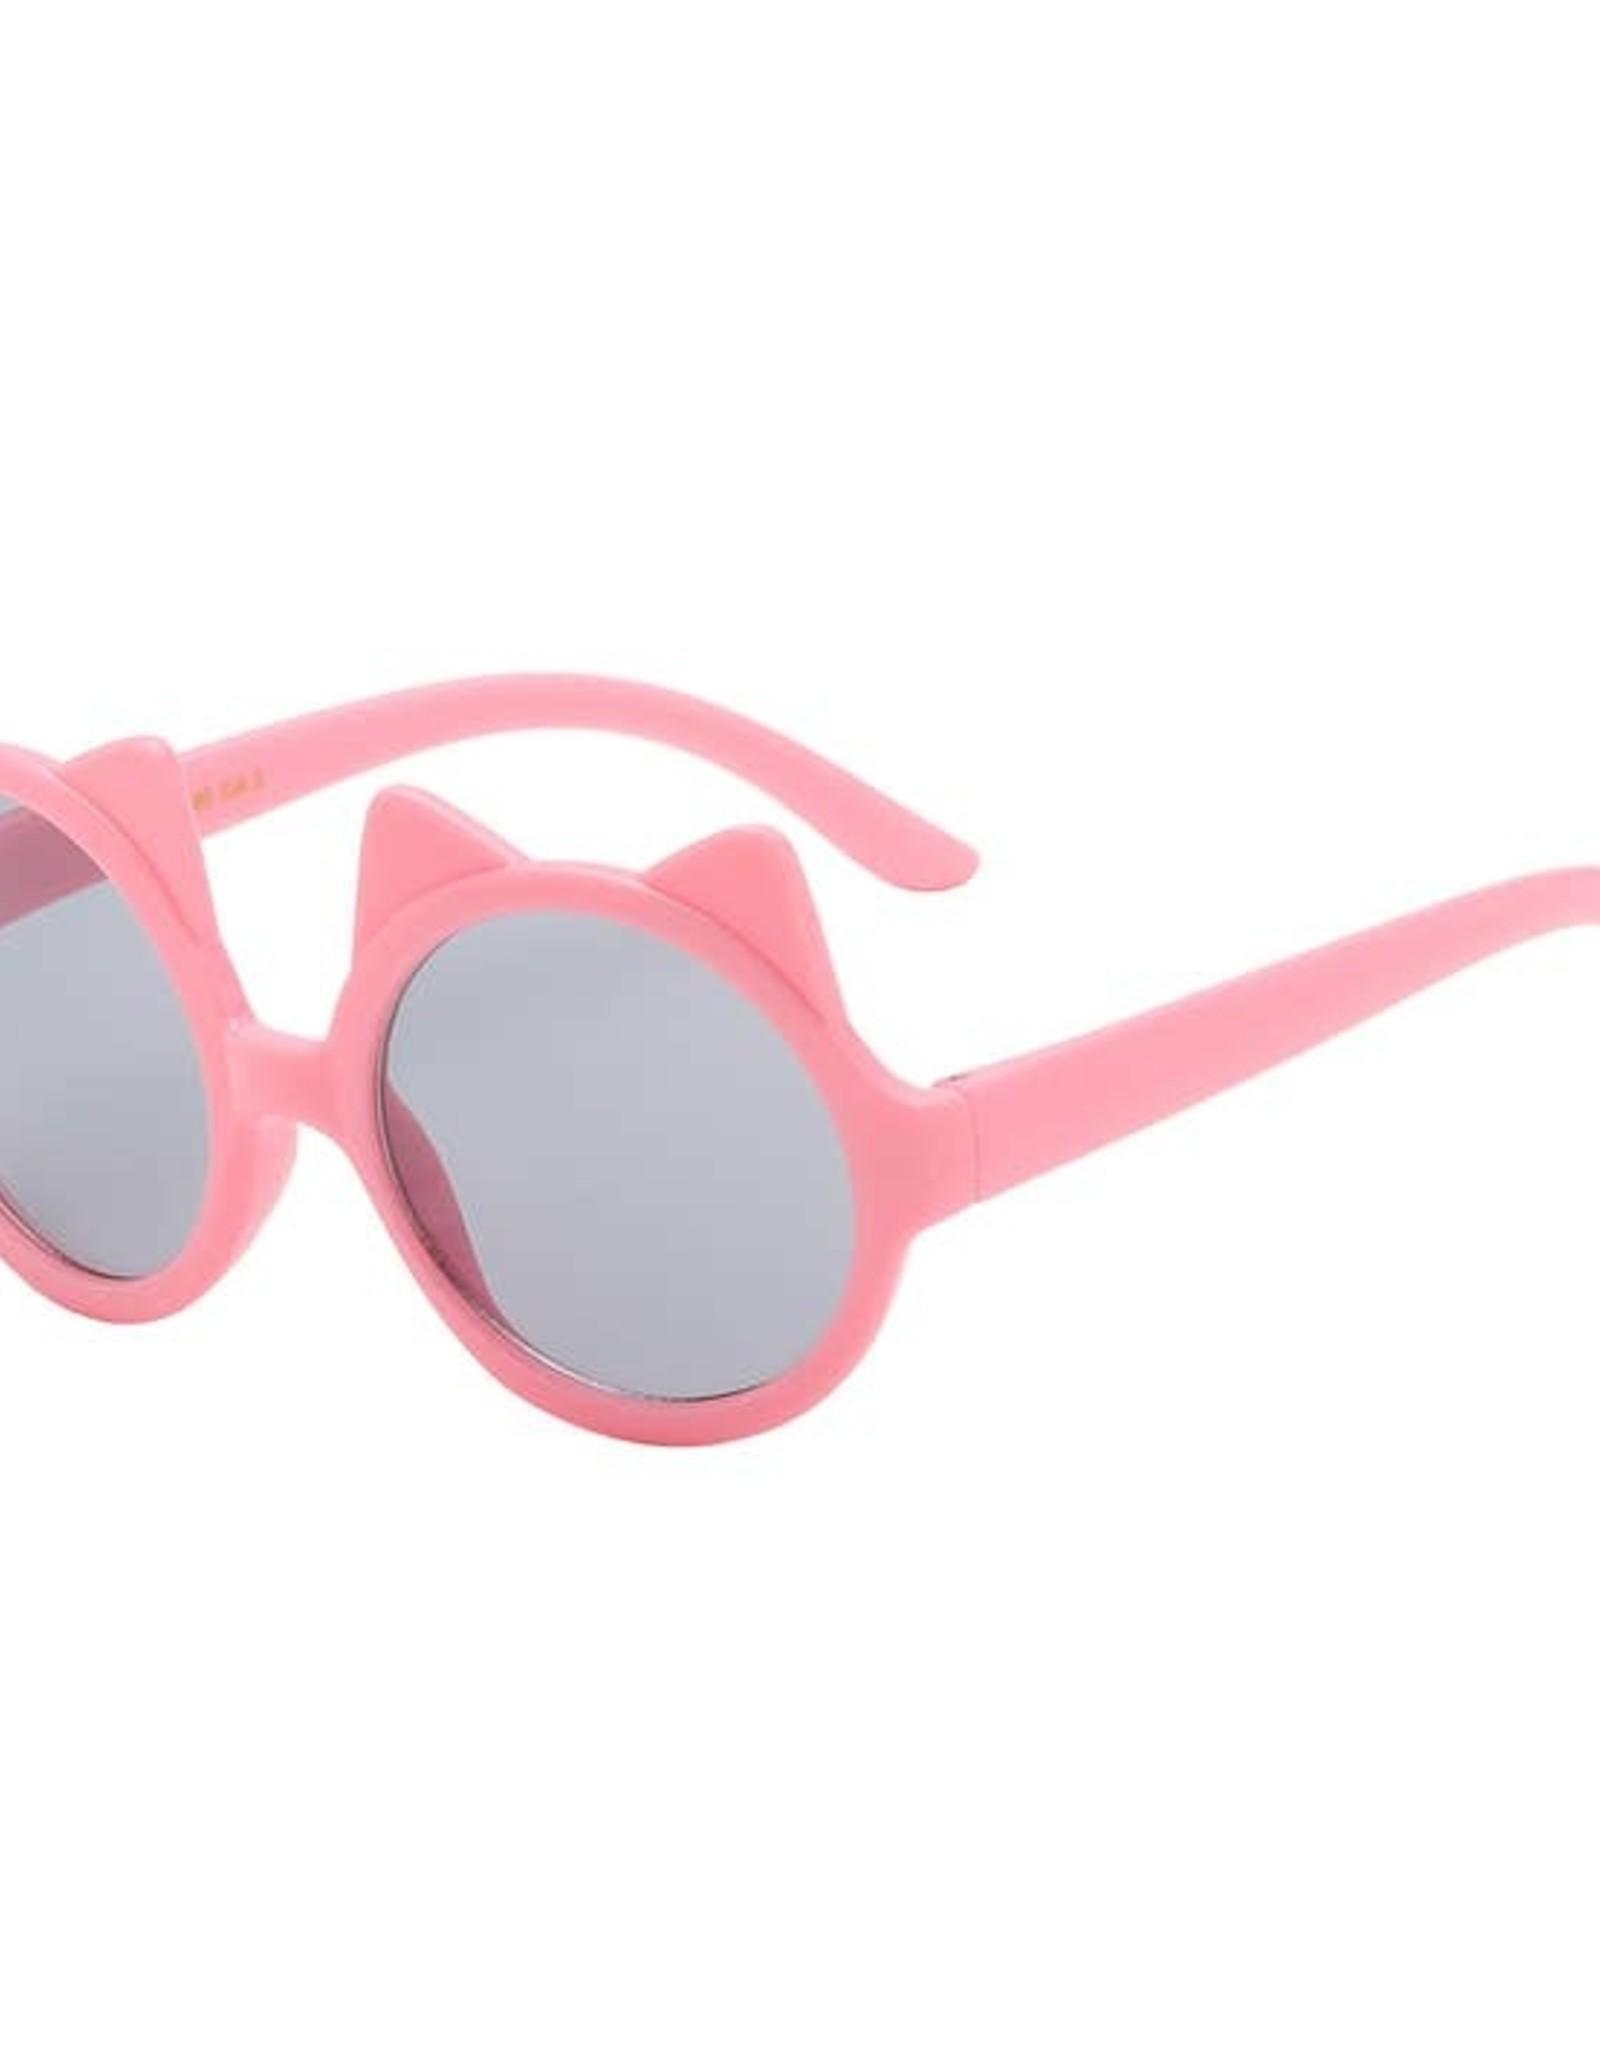 Kitty Sunglasses